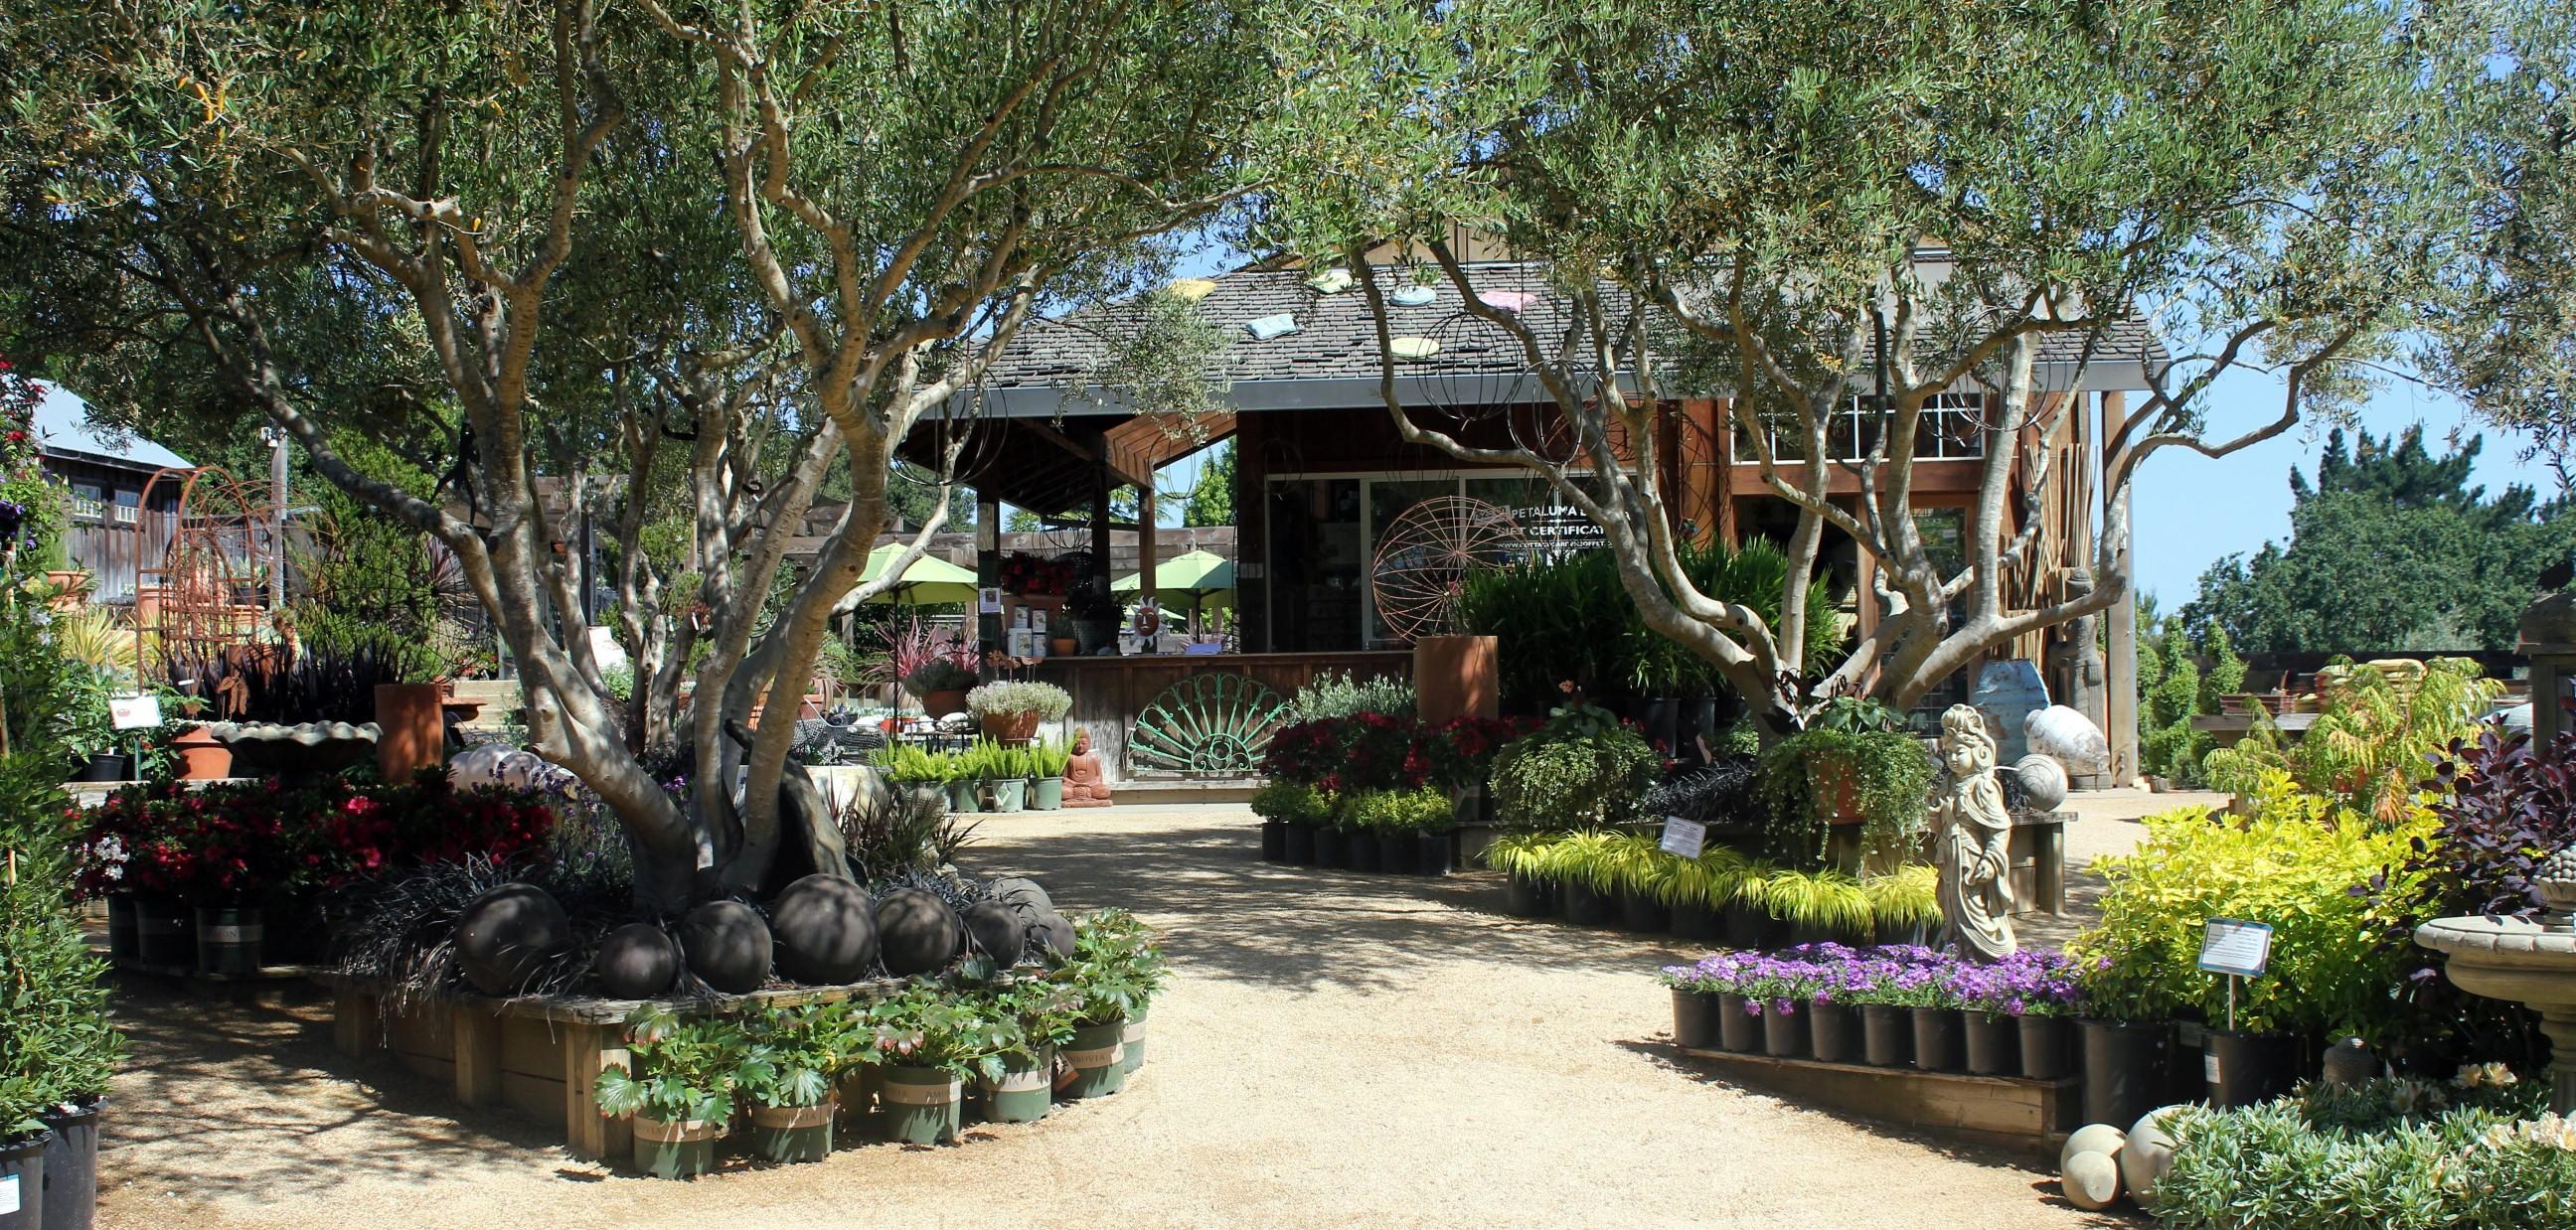 cottage gardens of petaluma JBQHCUC